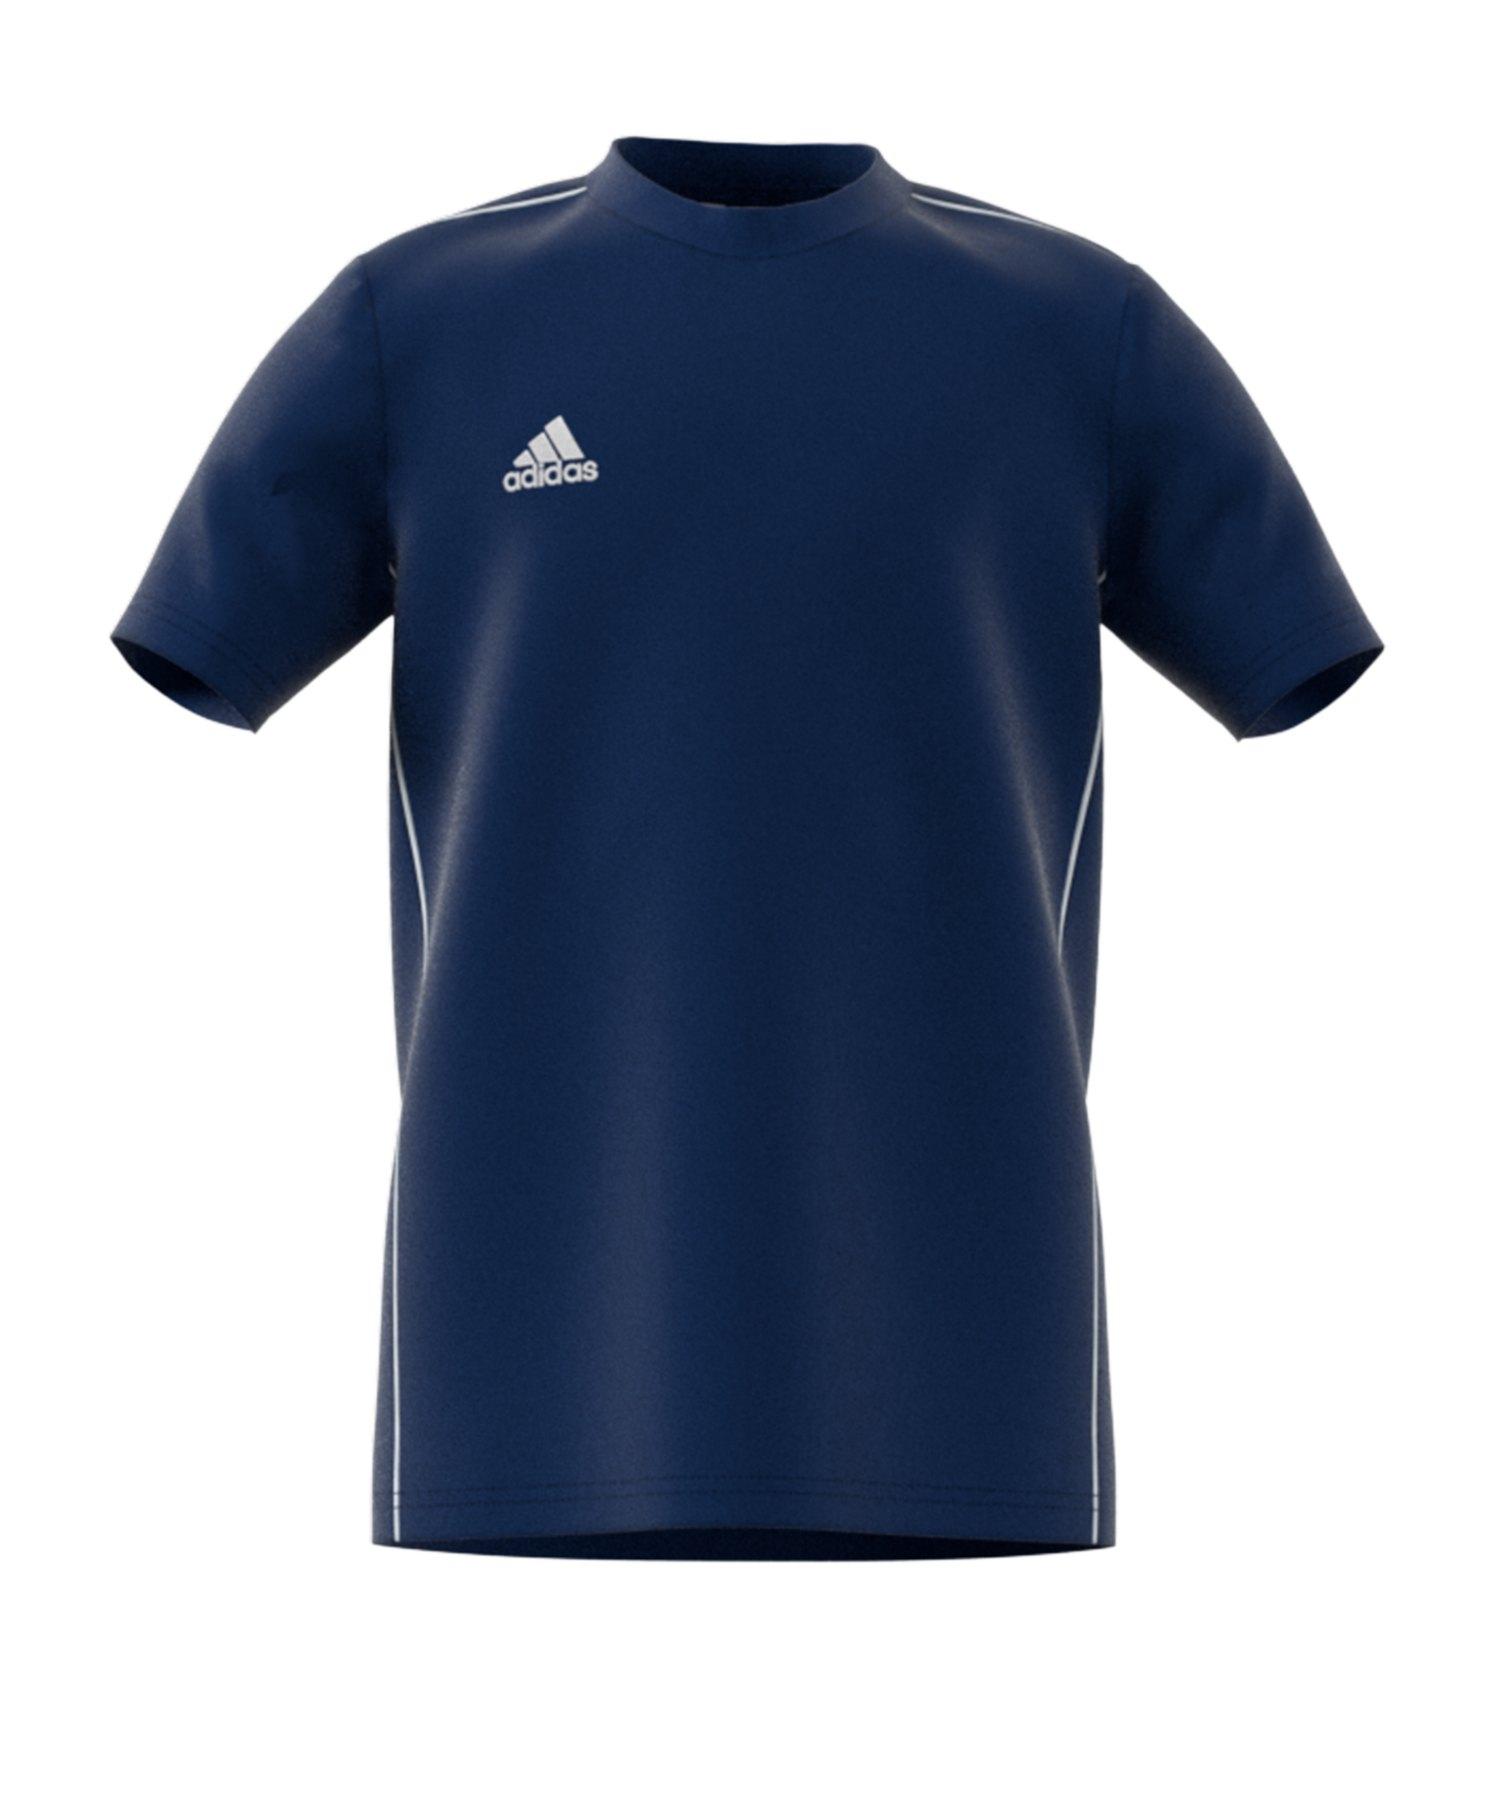 adidas Core 18 Tee T-Shirt Kids Blau Weiss - blau